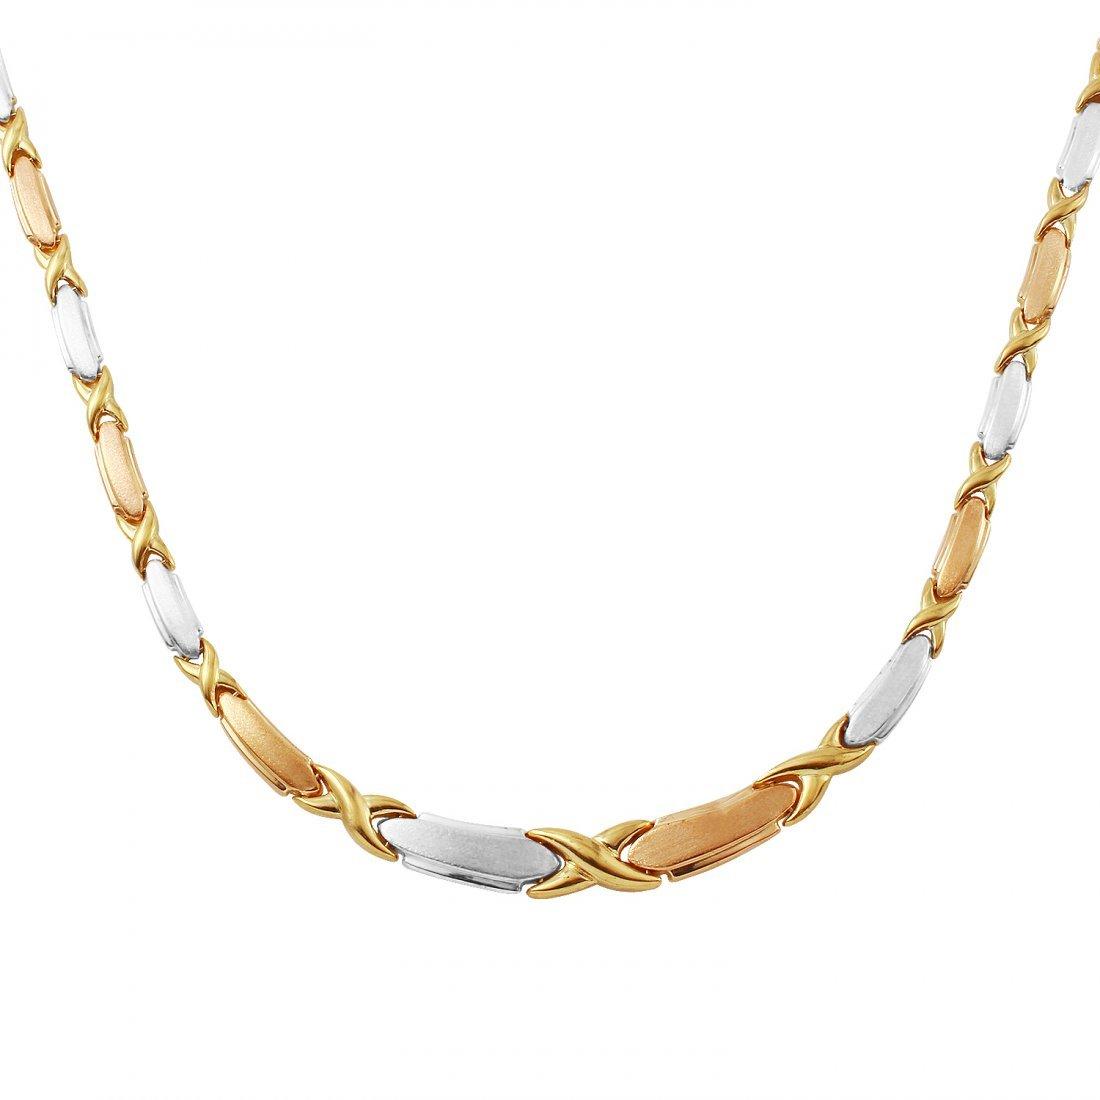 Ladies 14K Three tone Gold Necklace